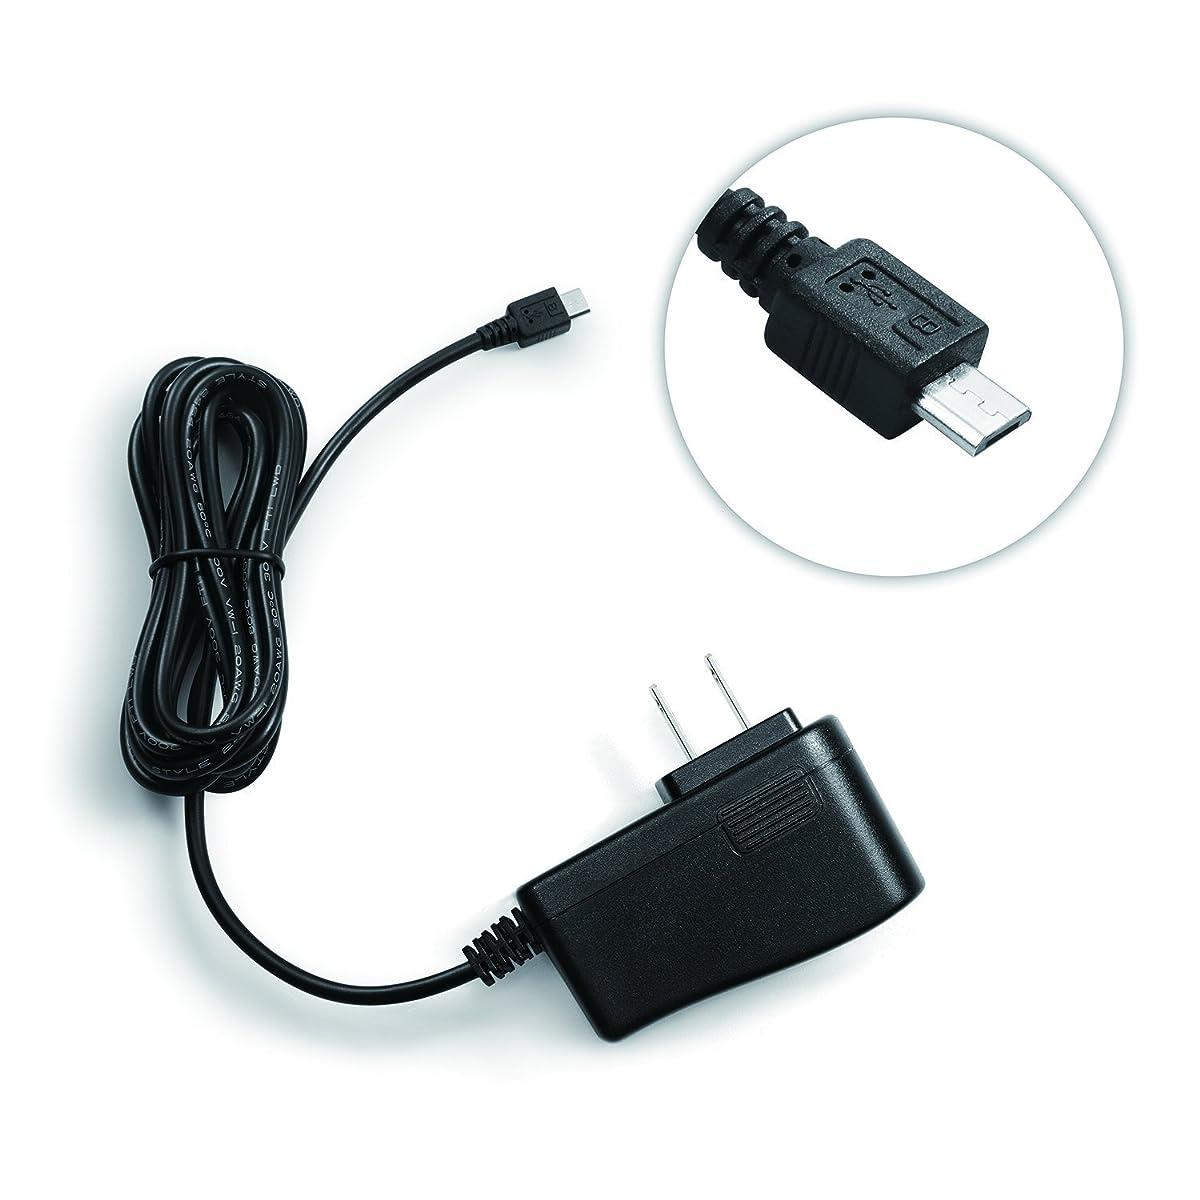 Bawofu 5V 2000mA Micro USB Power Supply Wall Charger AC/DC Adapter Universal Power Adapter